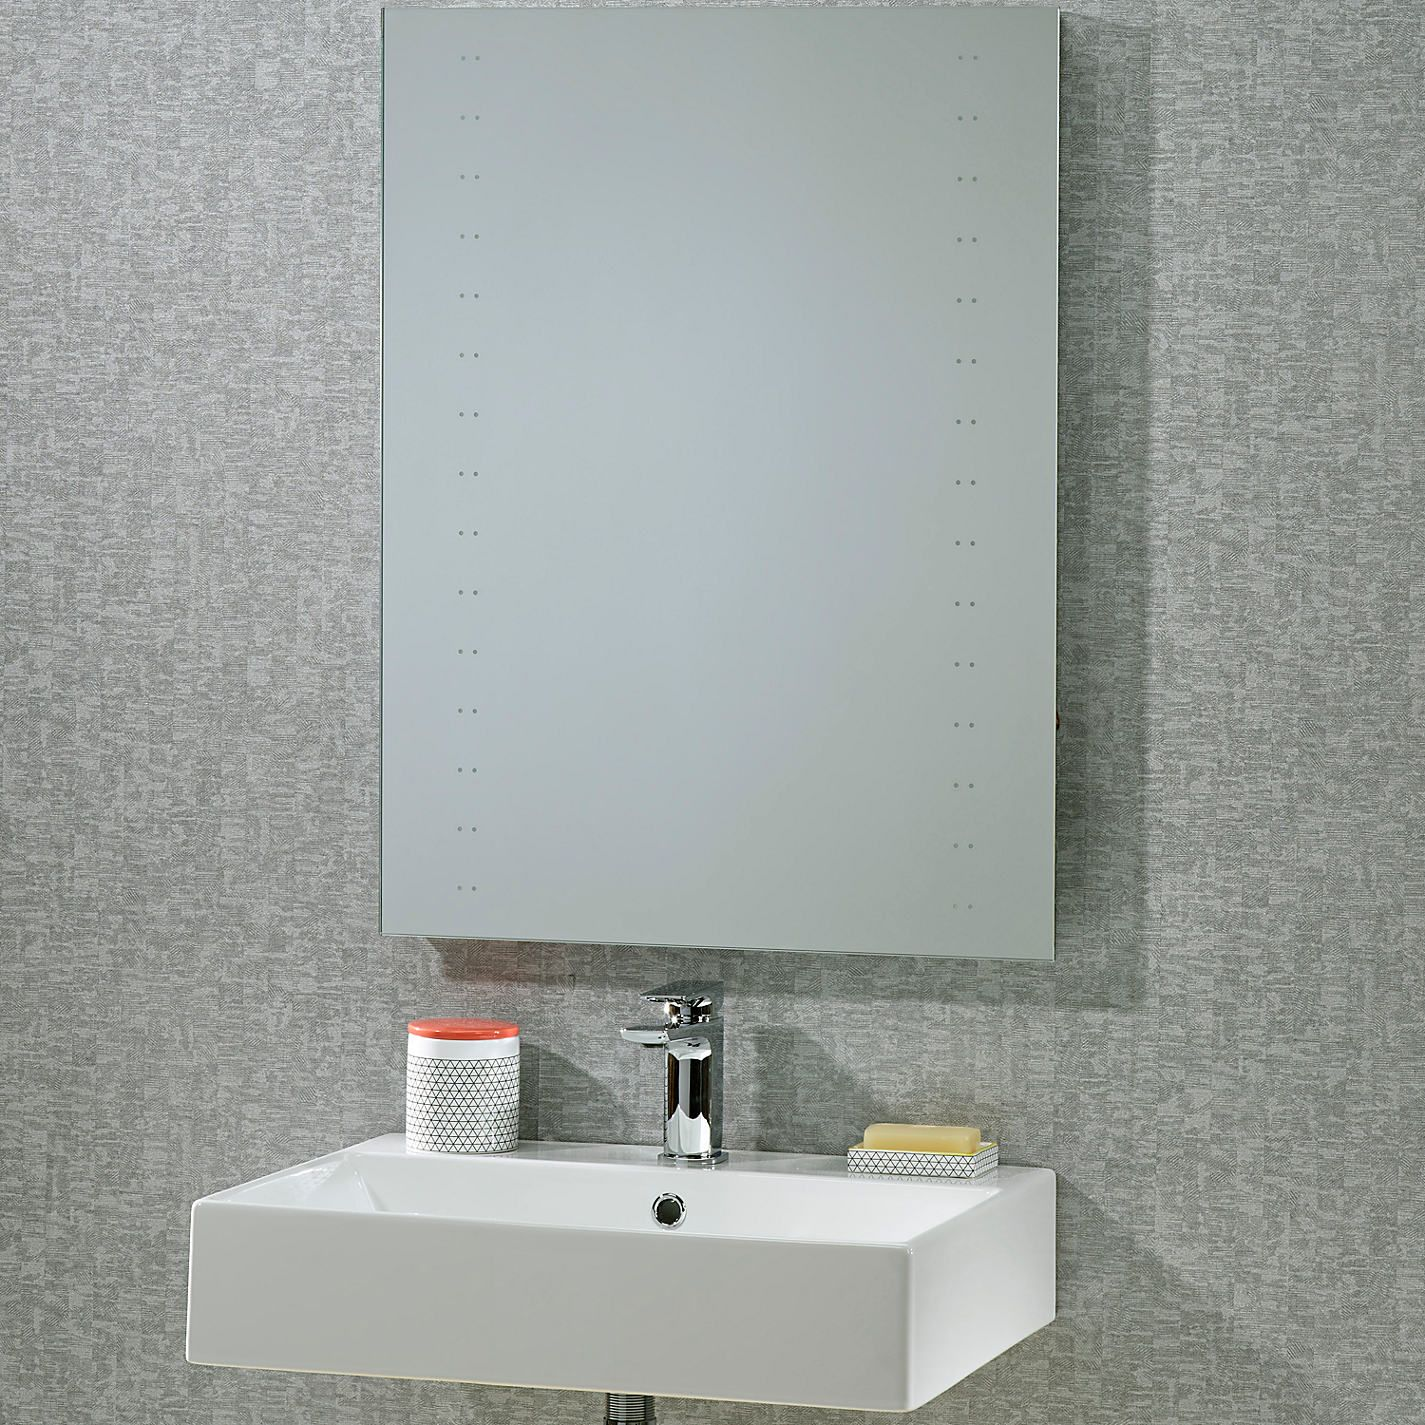 27 Luxury Rectangular Bathroom Mirrors Bathroom Rectangular Bathroom Mirror Over Ba Rectangular Bathroom Mirror Minimalist Bathroom Design Led Mirror Bathroom